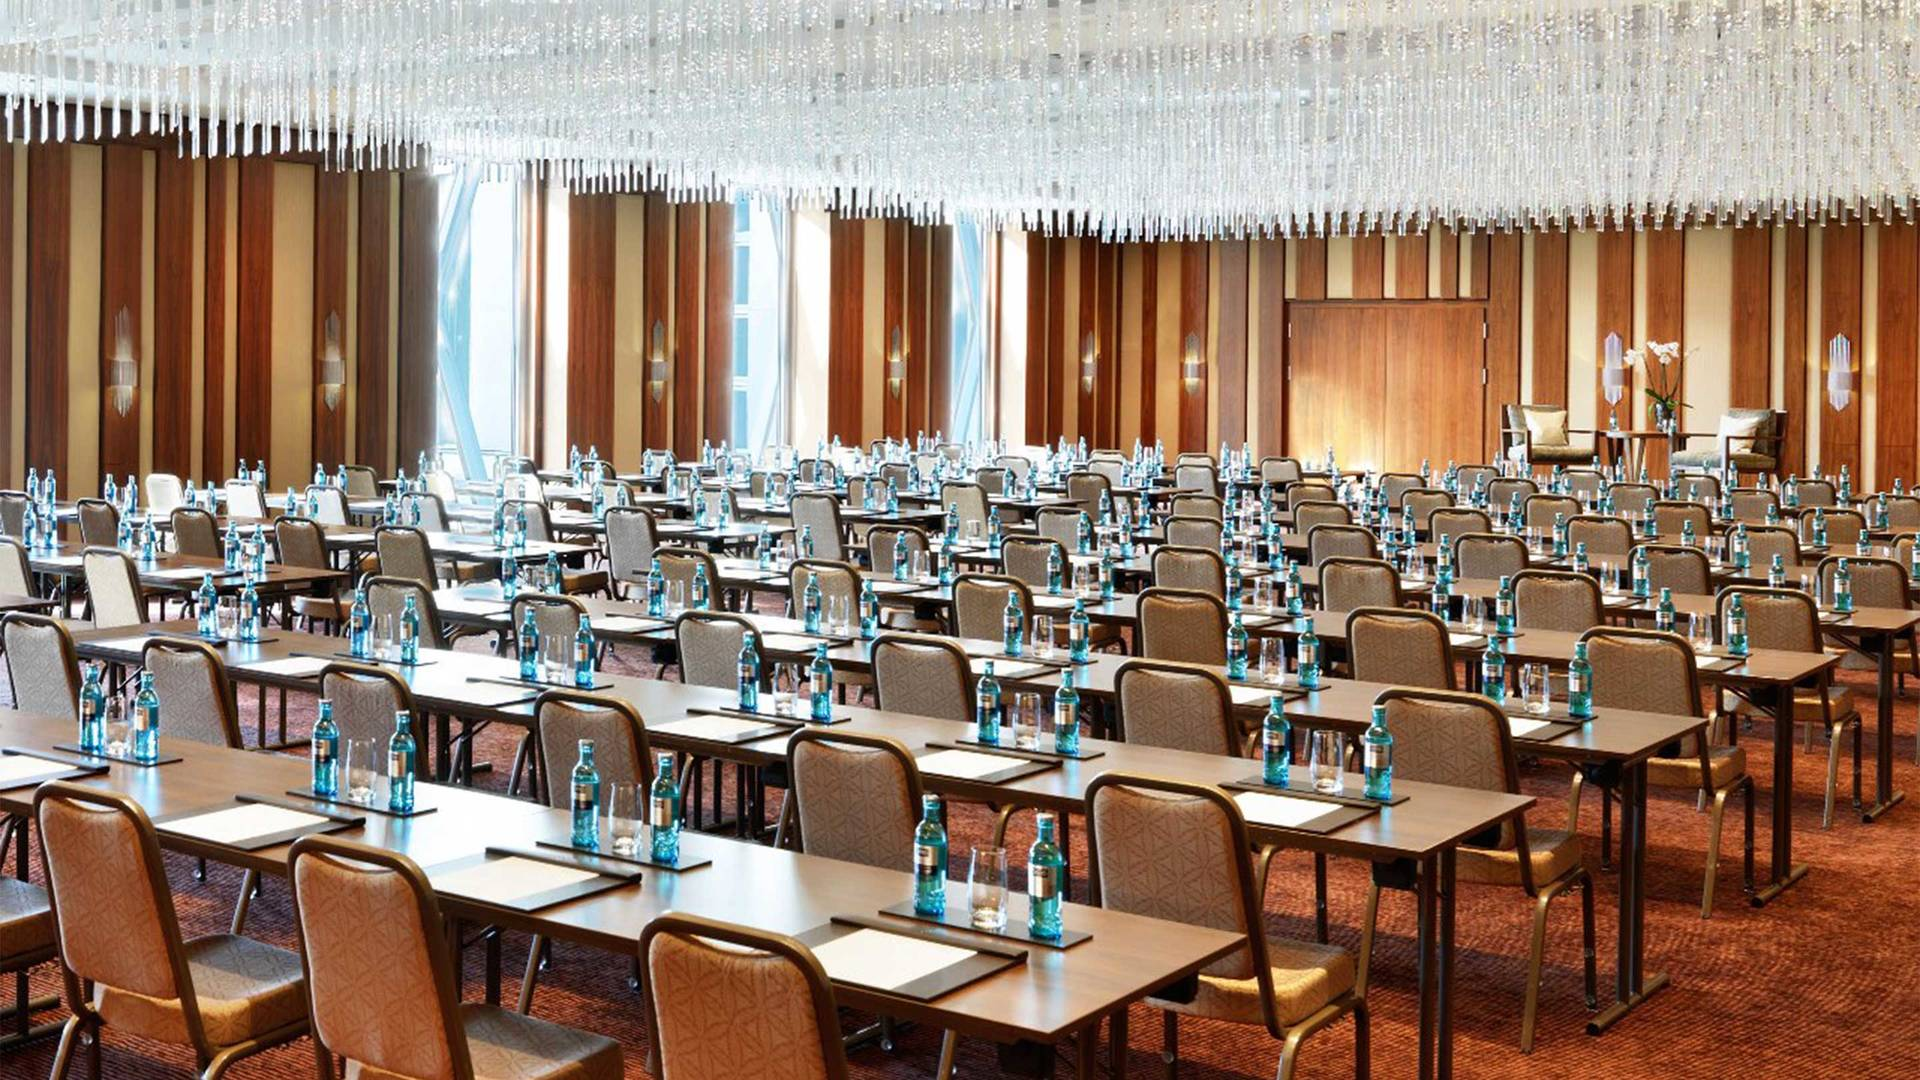 https://cdn.jumeirah.com/-/mediadh/DH/Hospitality/Jumeirah/Hotels/Frankfurt/Jumeirah-Frankfurt/Meeting-Rooms/16-9_Hero-thumbnail_Jumeirah-Frankfurt-Crystal-Ballroom-Classroom-Setup_landscape.jpg?h=1080&w=1920&hash=9951CB1FA28B973C8129E8BBB639A611